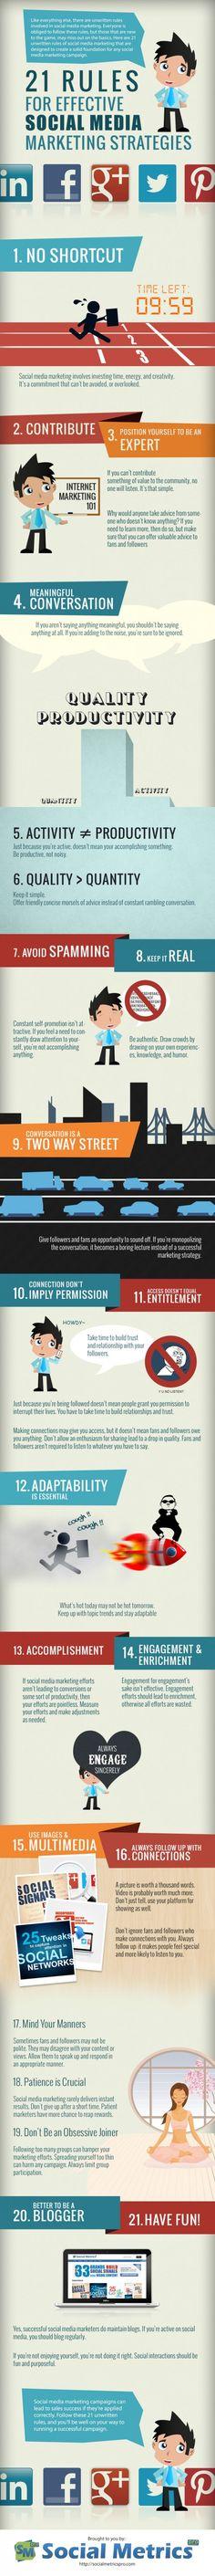 21 socialmedia rules for your social media strategy. #SocialMedia #SMStrategy #Community #Conversation